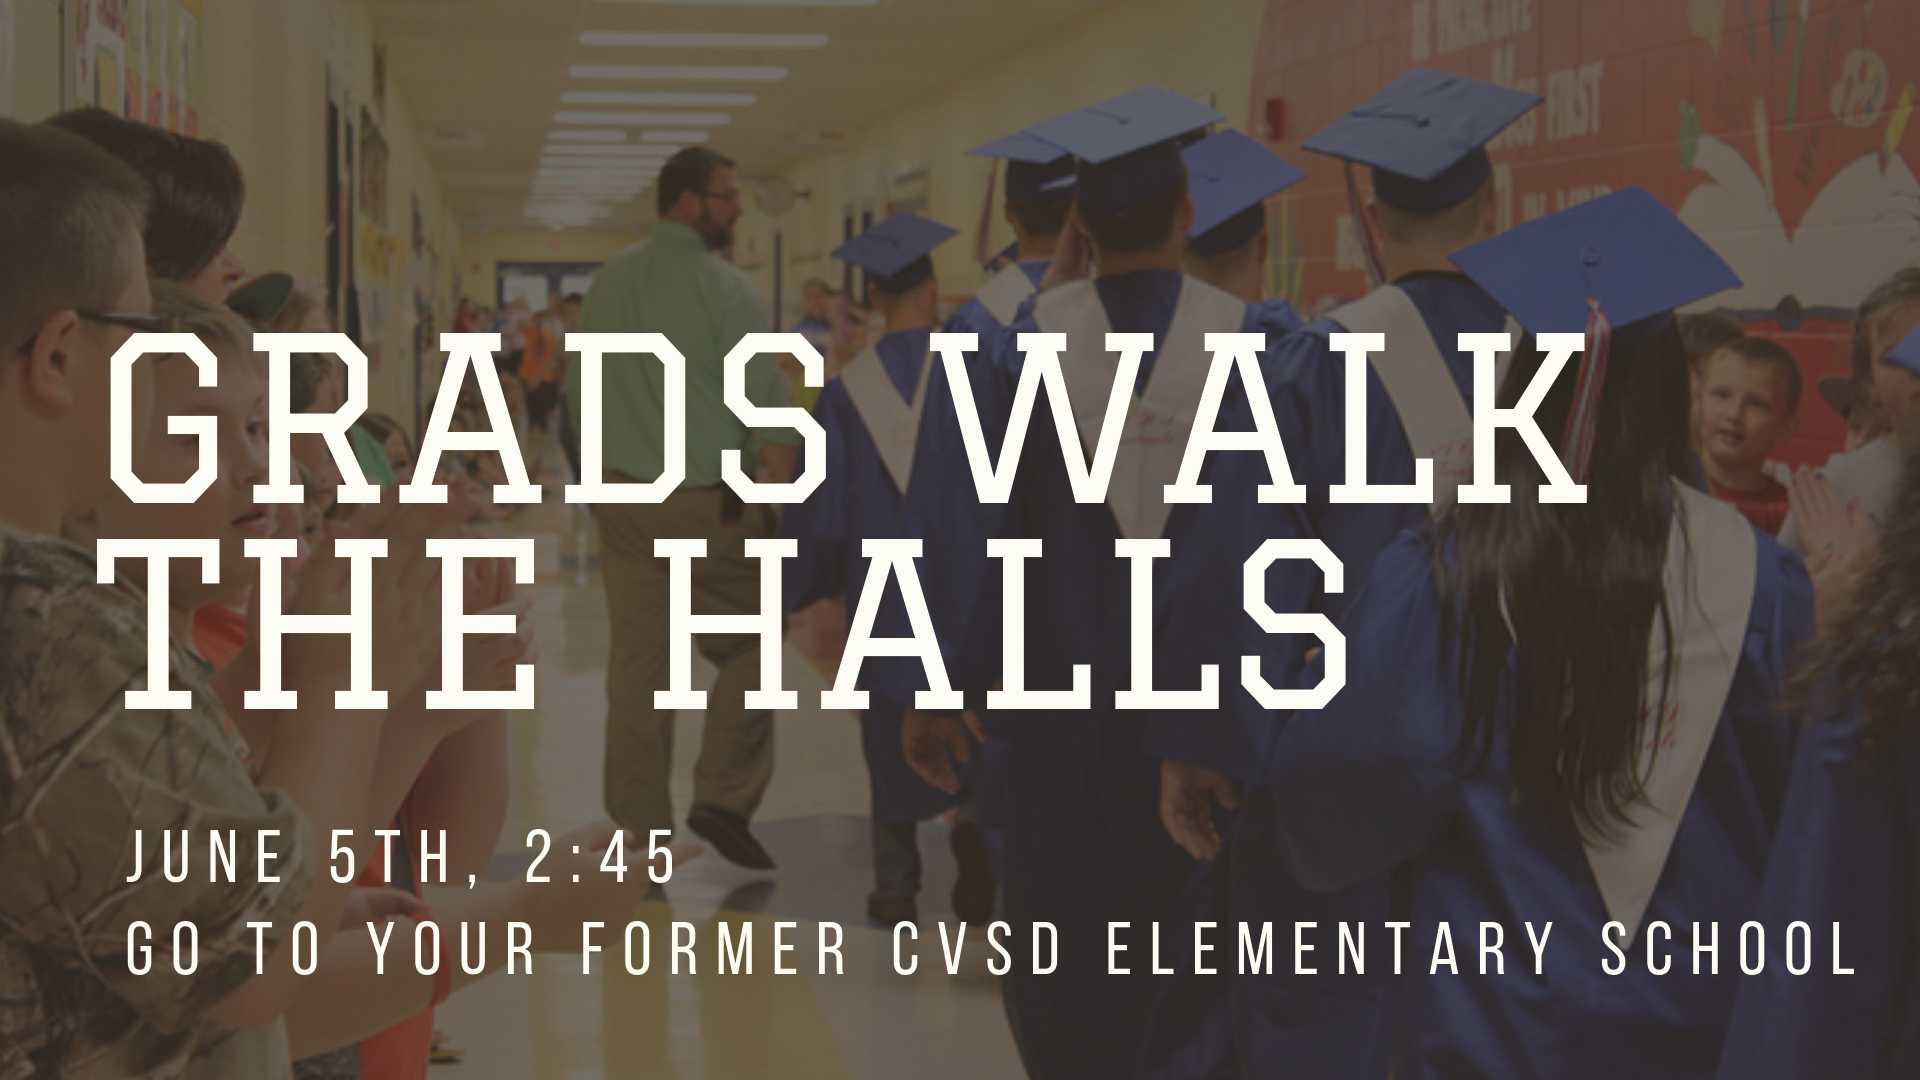 Grads walk the halls